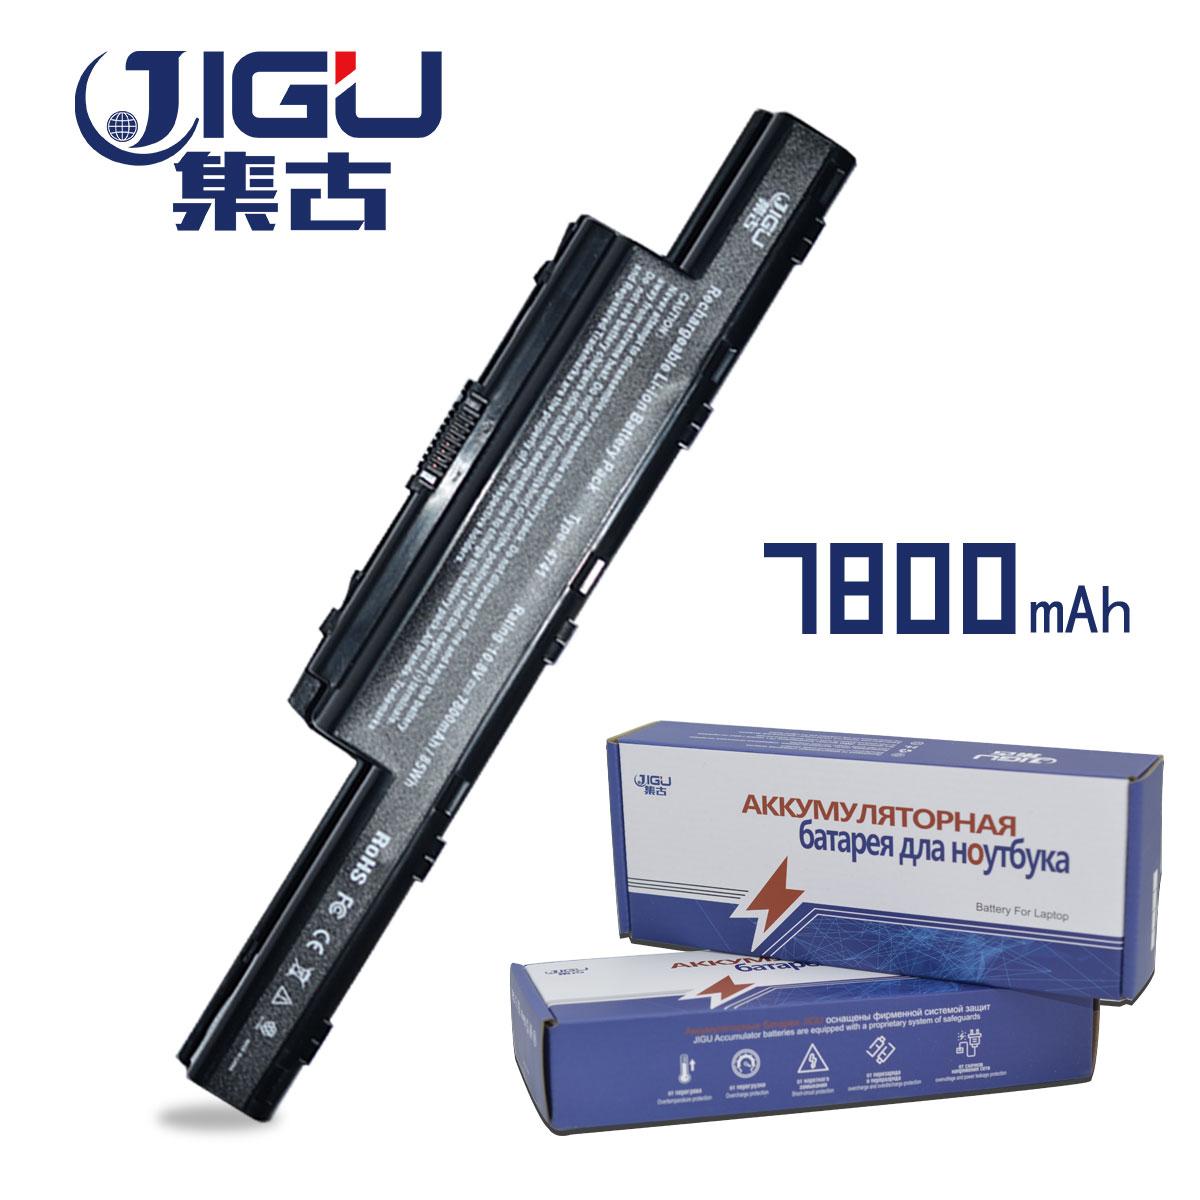 JIGU AS10D31 Laptop Battery For Acer Aspire 5736Z 5736ZG 5741G 5741Z 5742 5742G 5742Z 5742ZG 5750 5750G 5750TG 5750ZG цена 2017